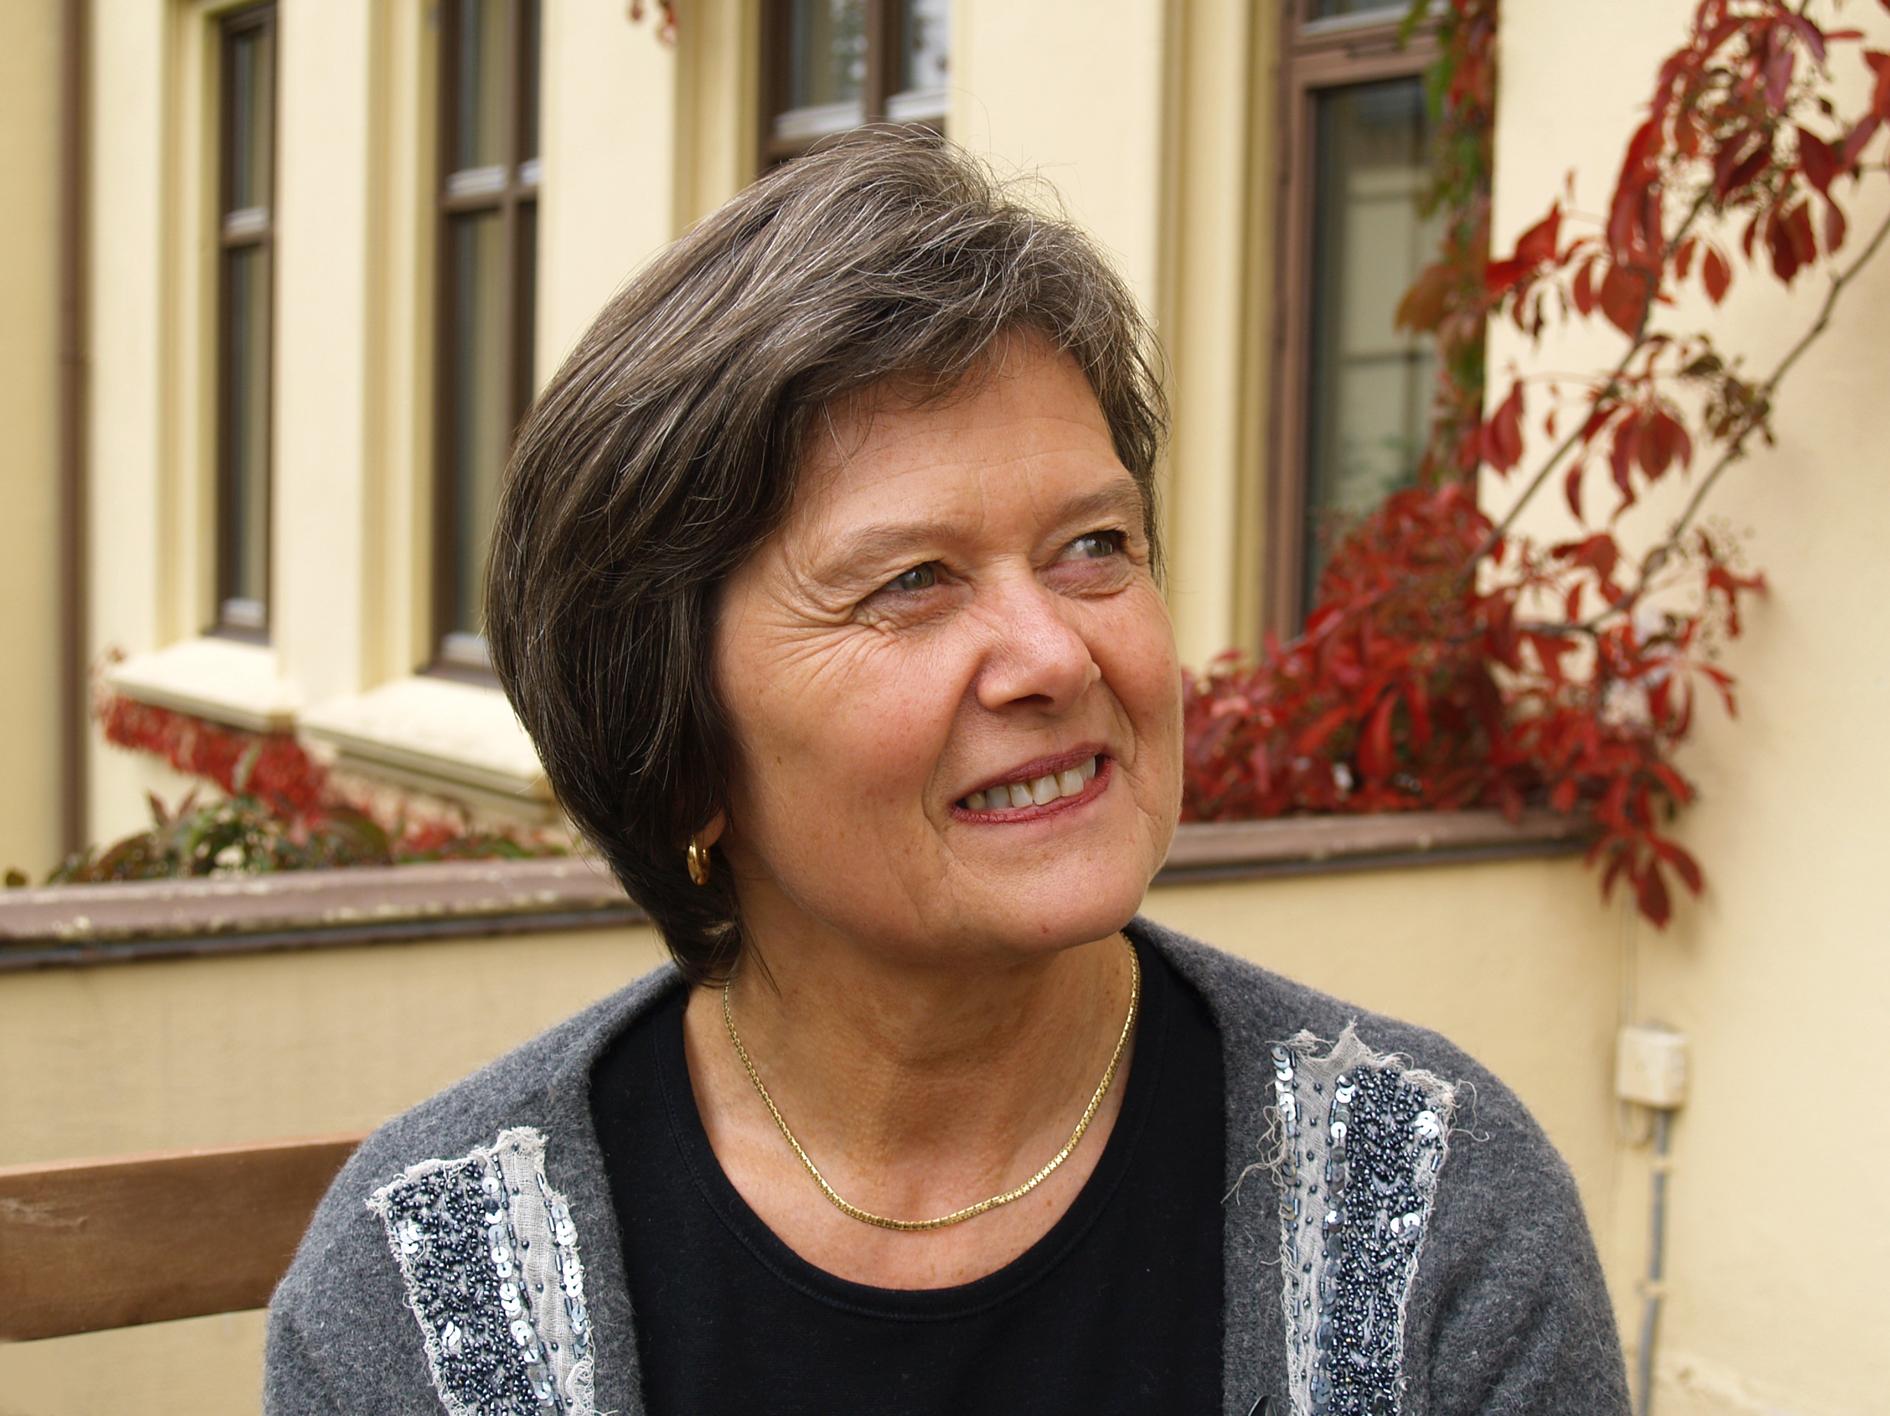 Helga Haugland Byfuglien